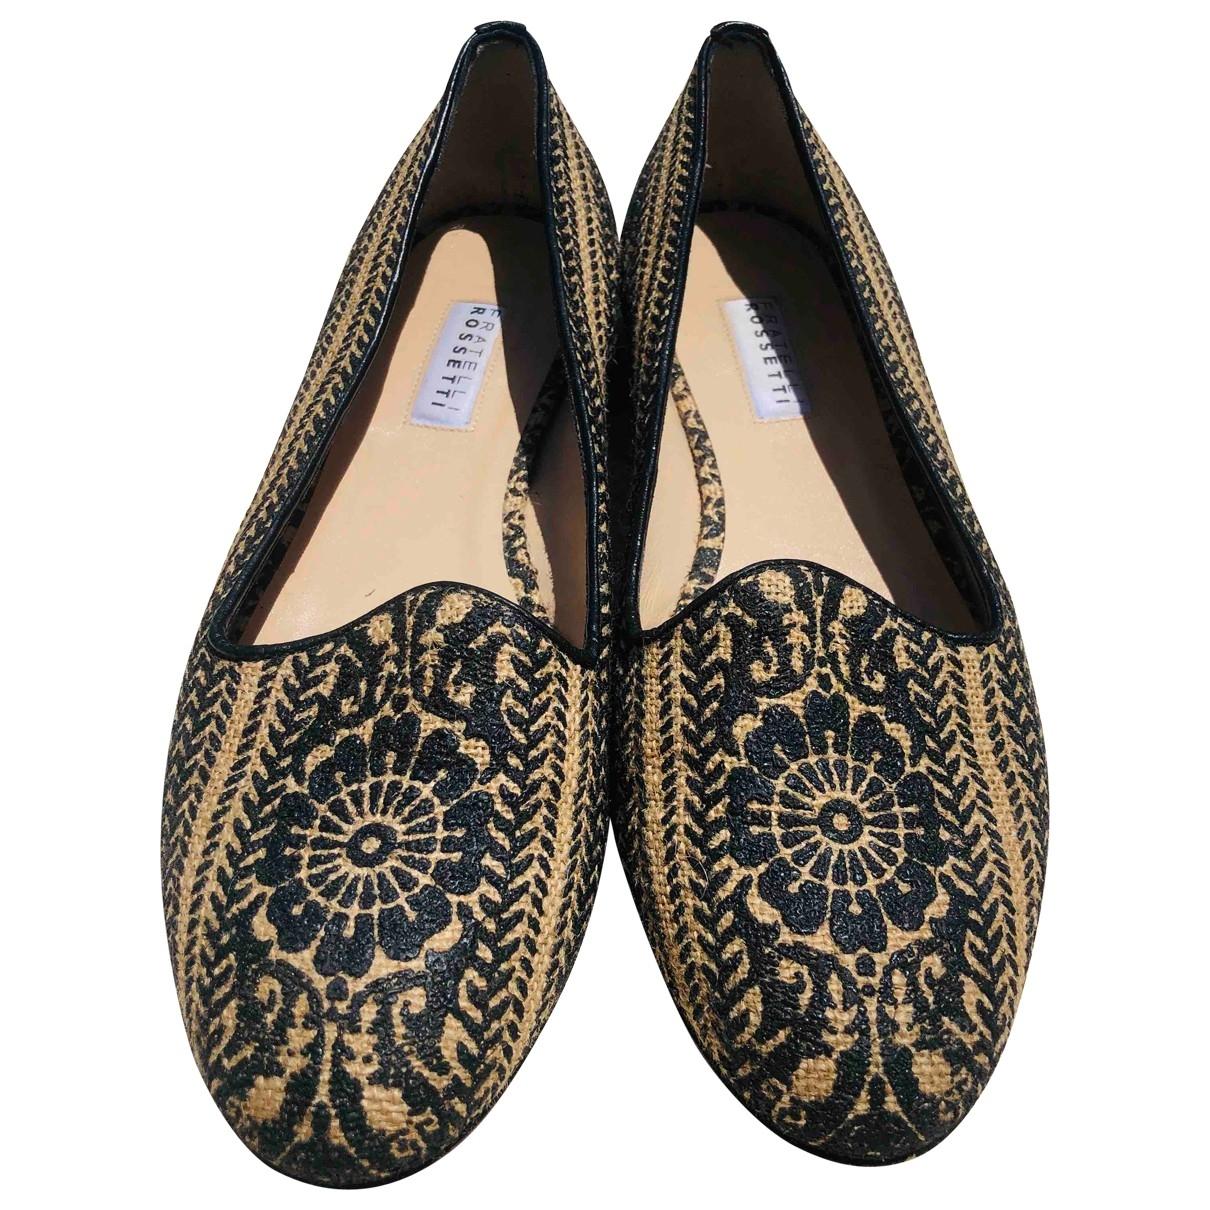 Fratelli Rossetti \N Black Leather Flats for Women 37 EU